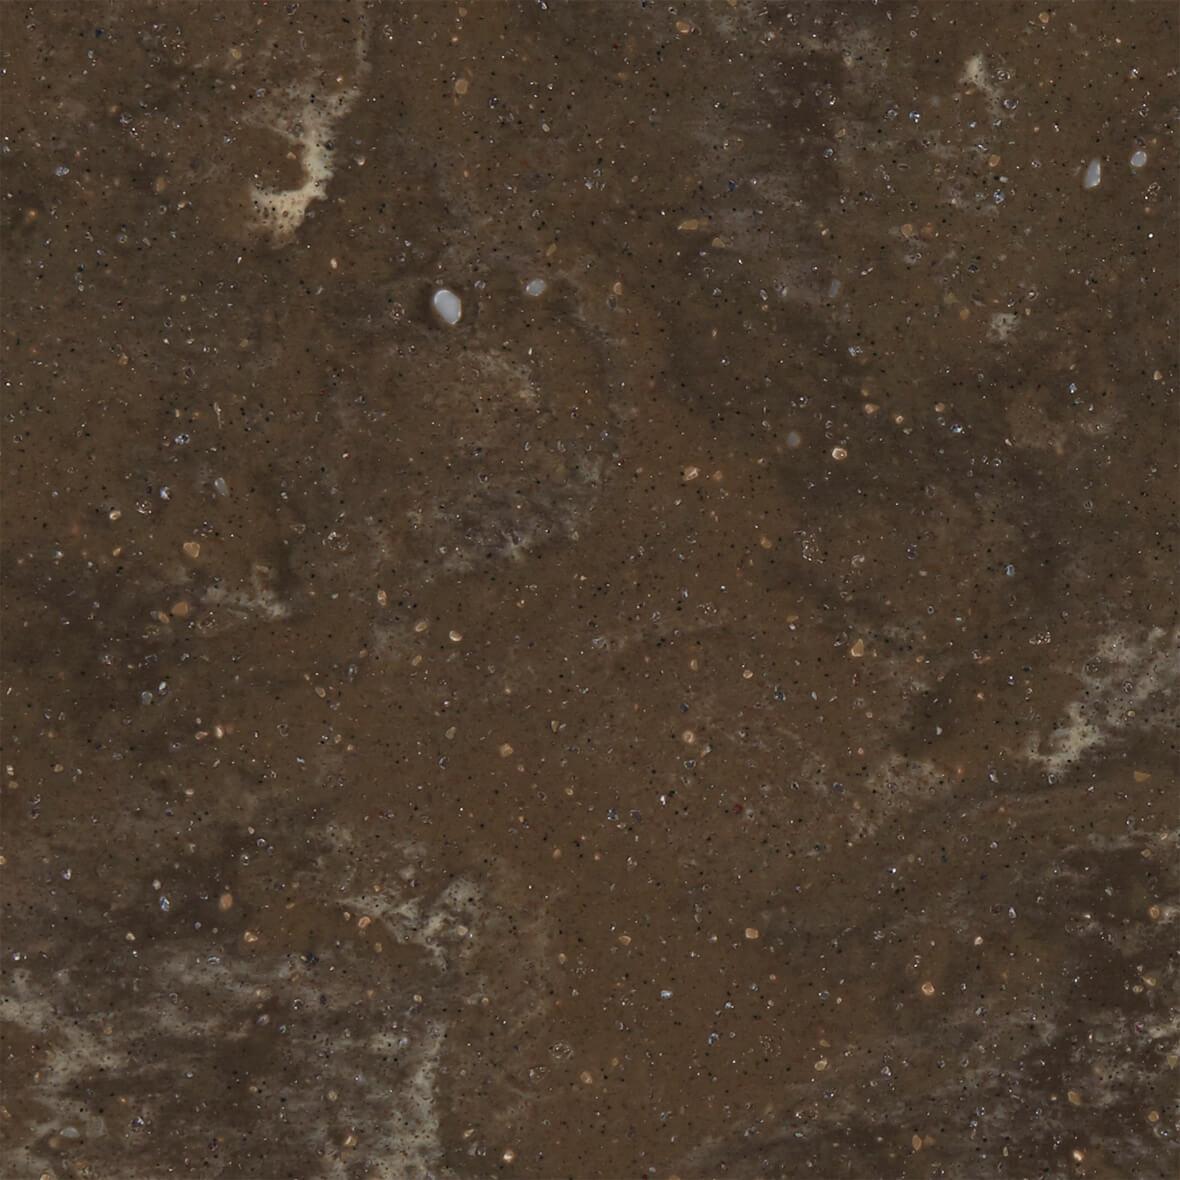 VL155メイン画像イメージ